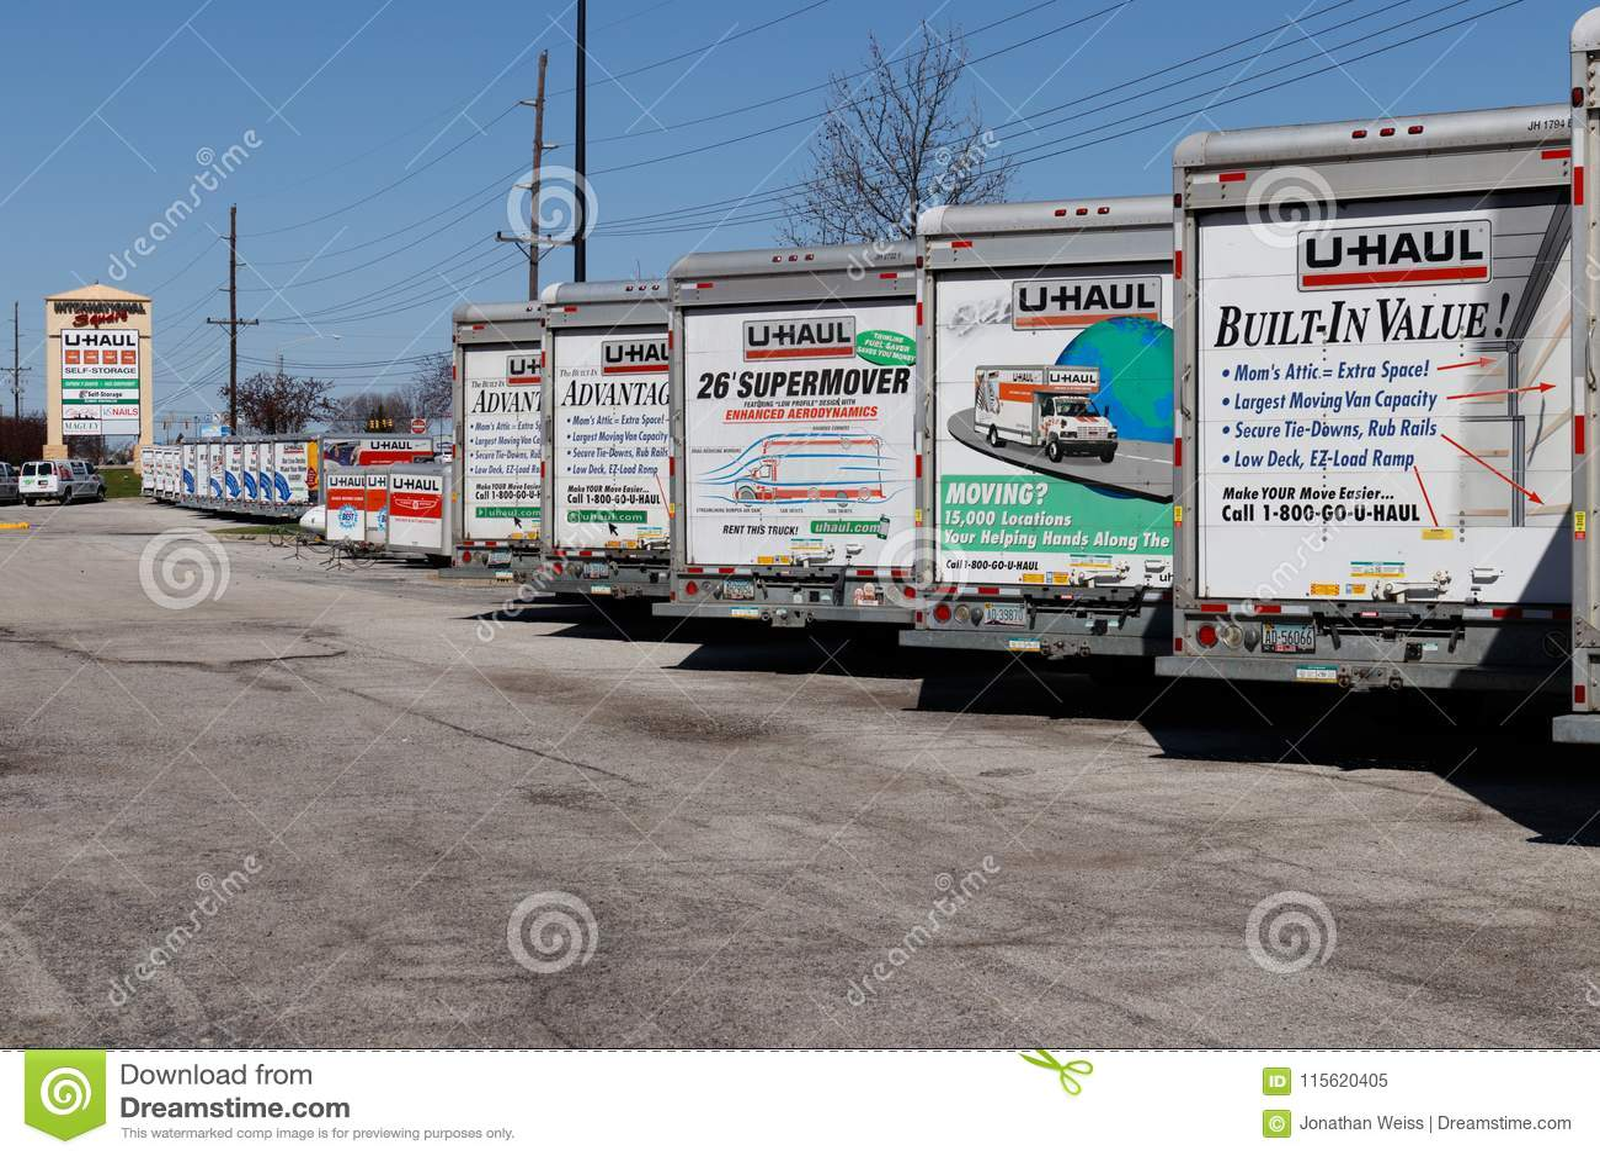 Uhaul Truck Rental Locations Near Me Uhaul Truck Rentals